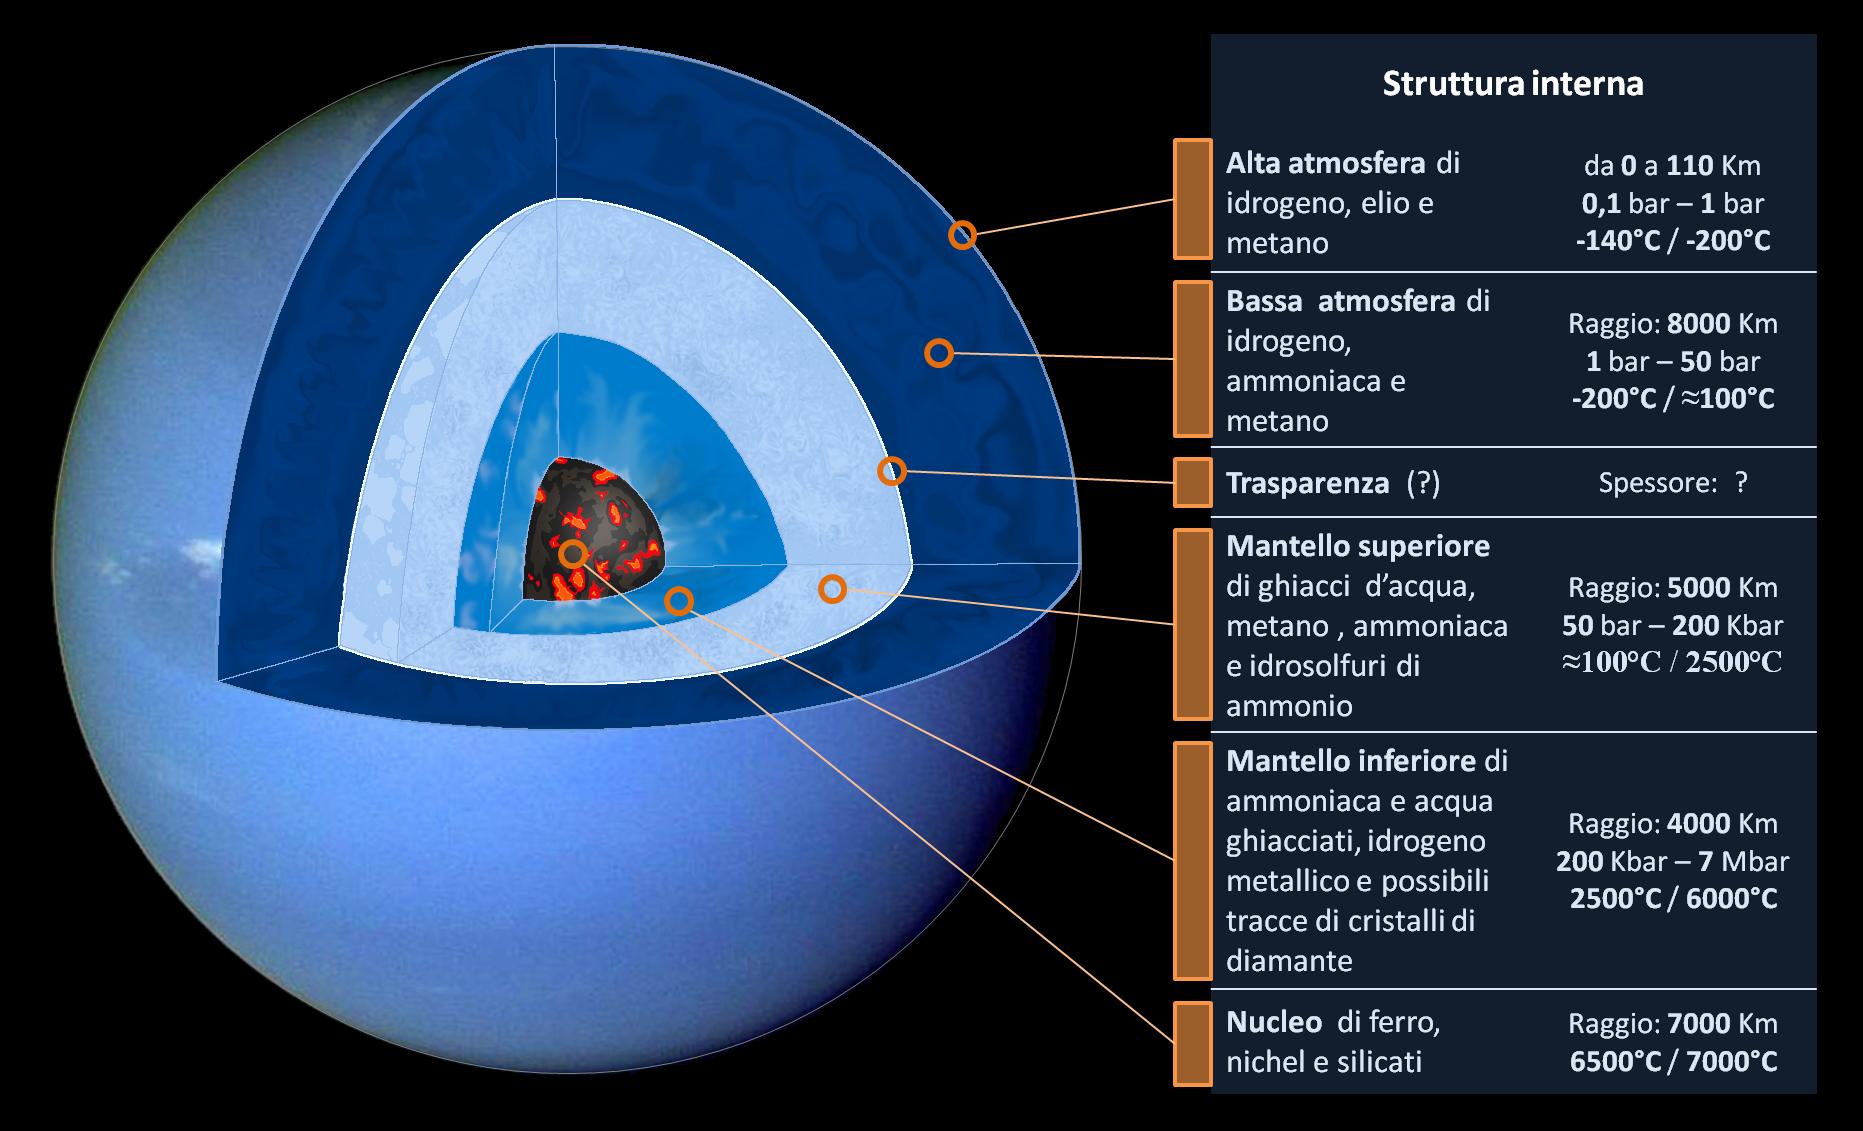 Struttura interna di Nettuno - Wikiwand